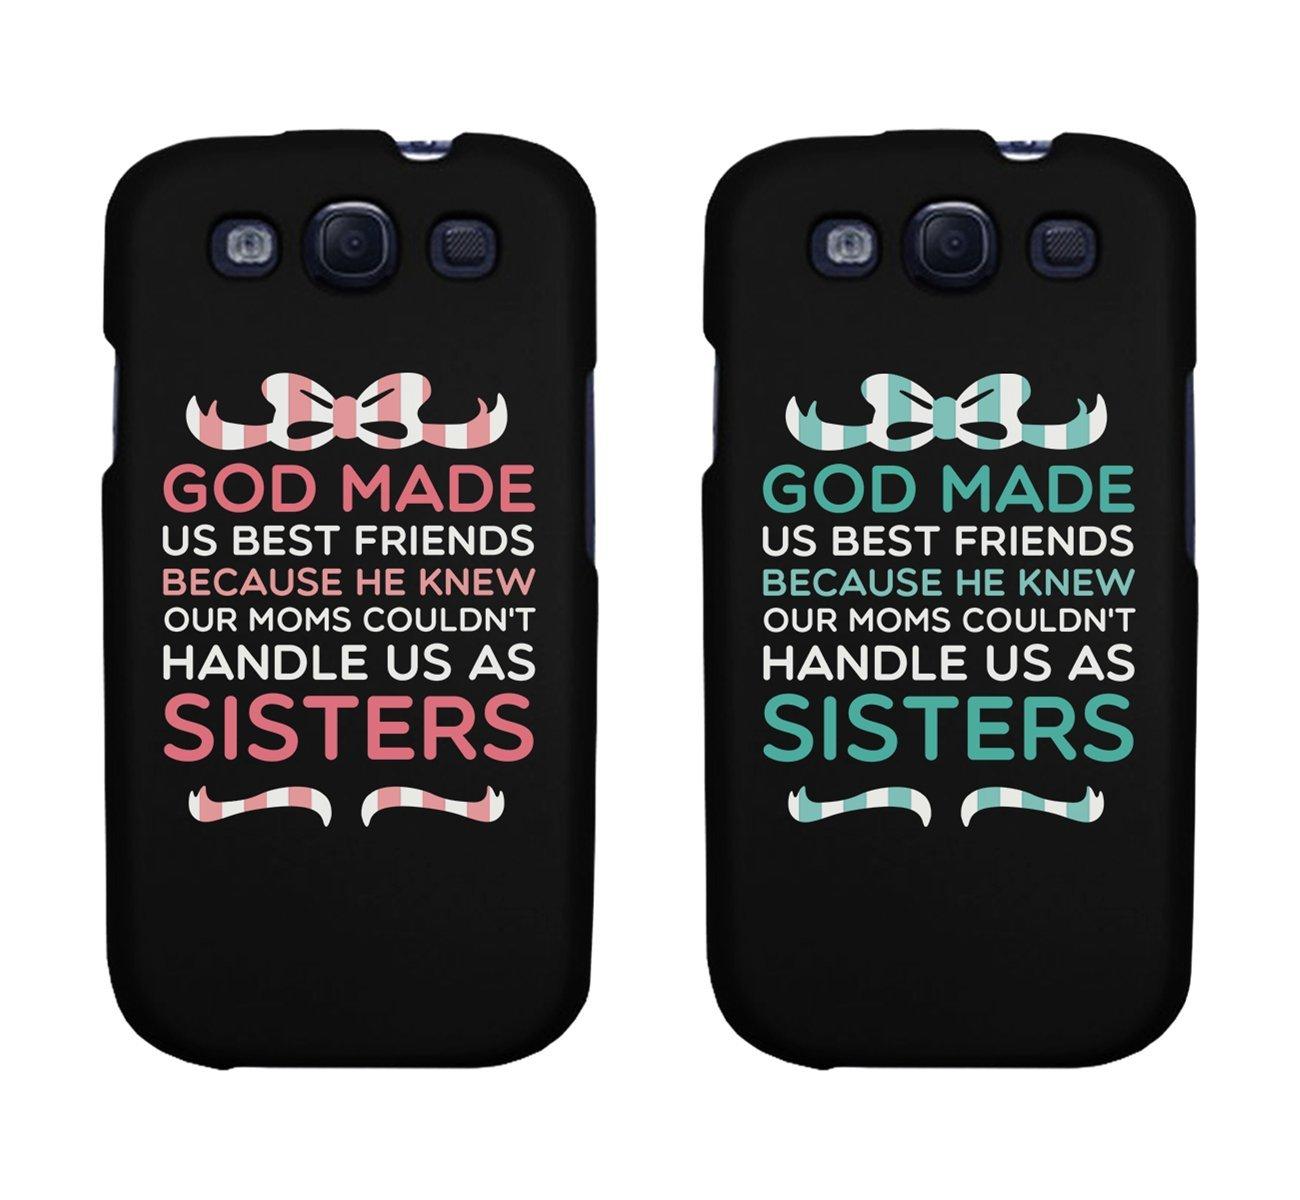 3 Best Friend Iphone 4 Cases images  hdimagelibcom